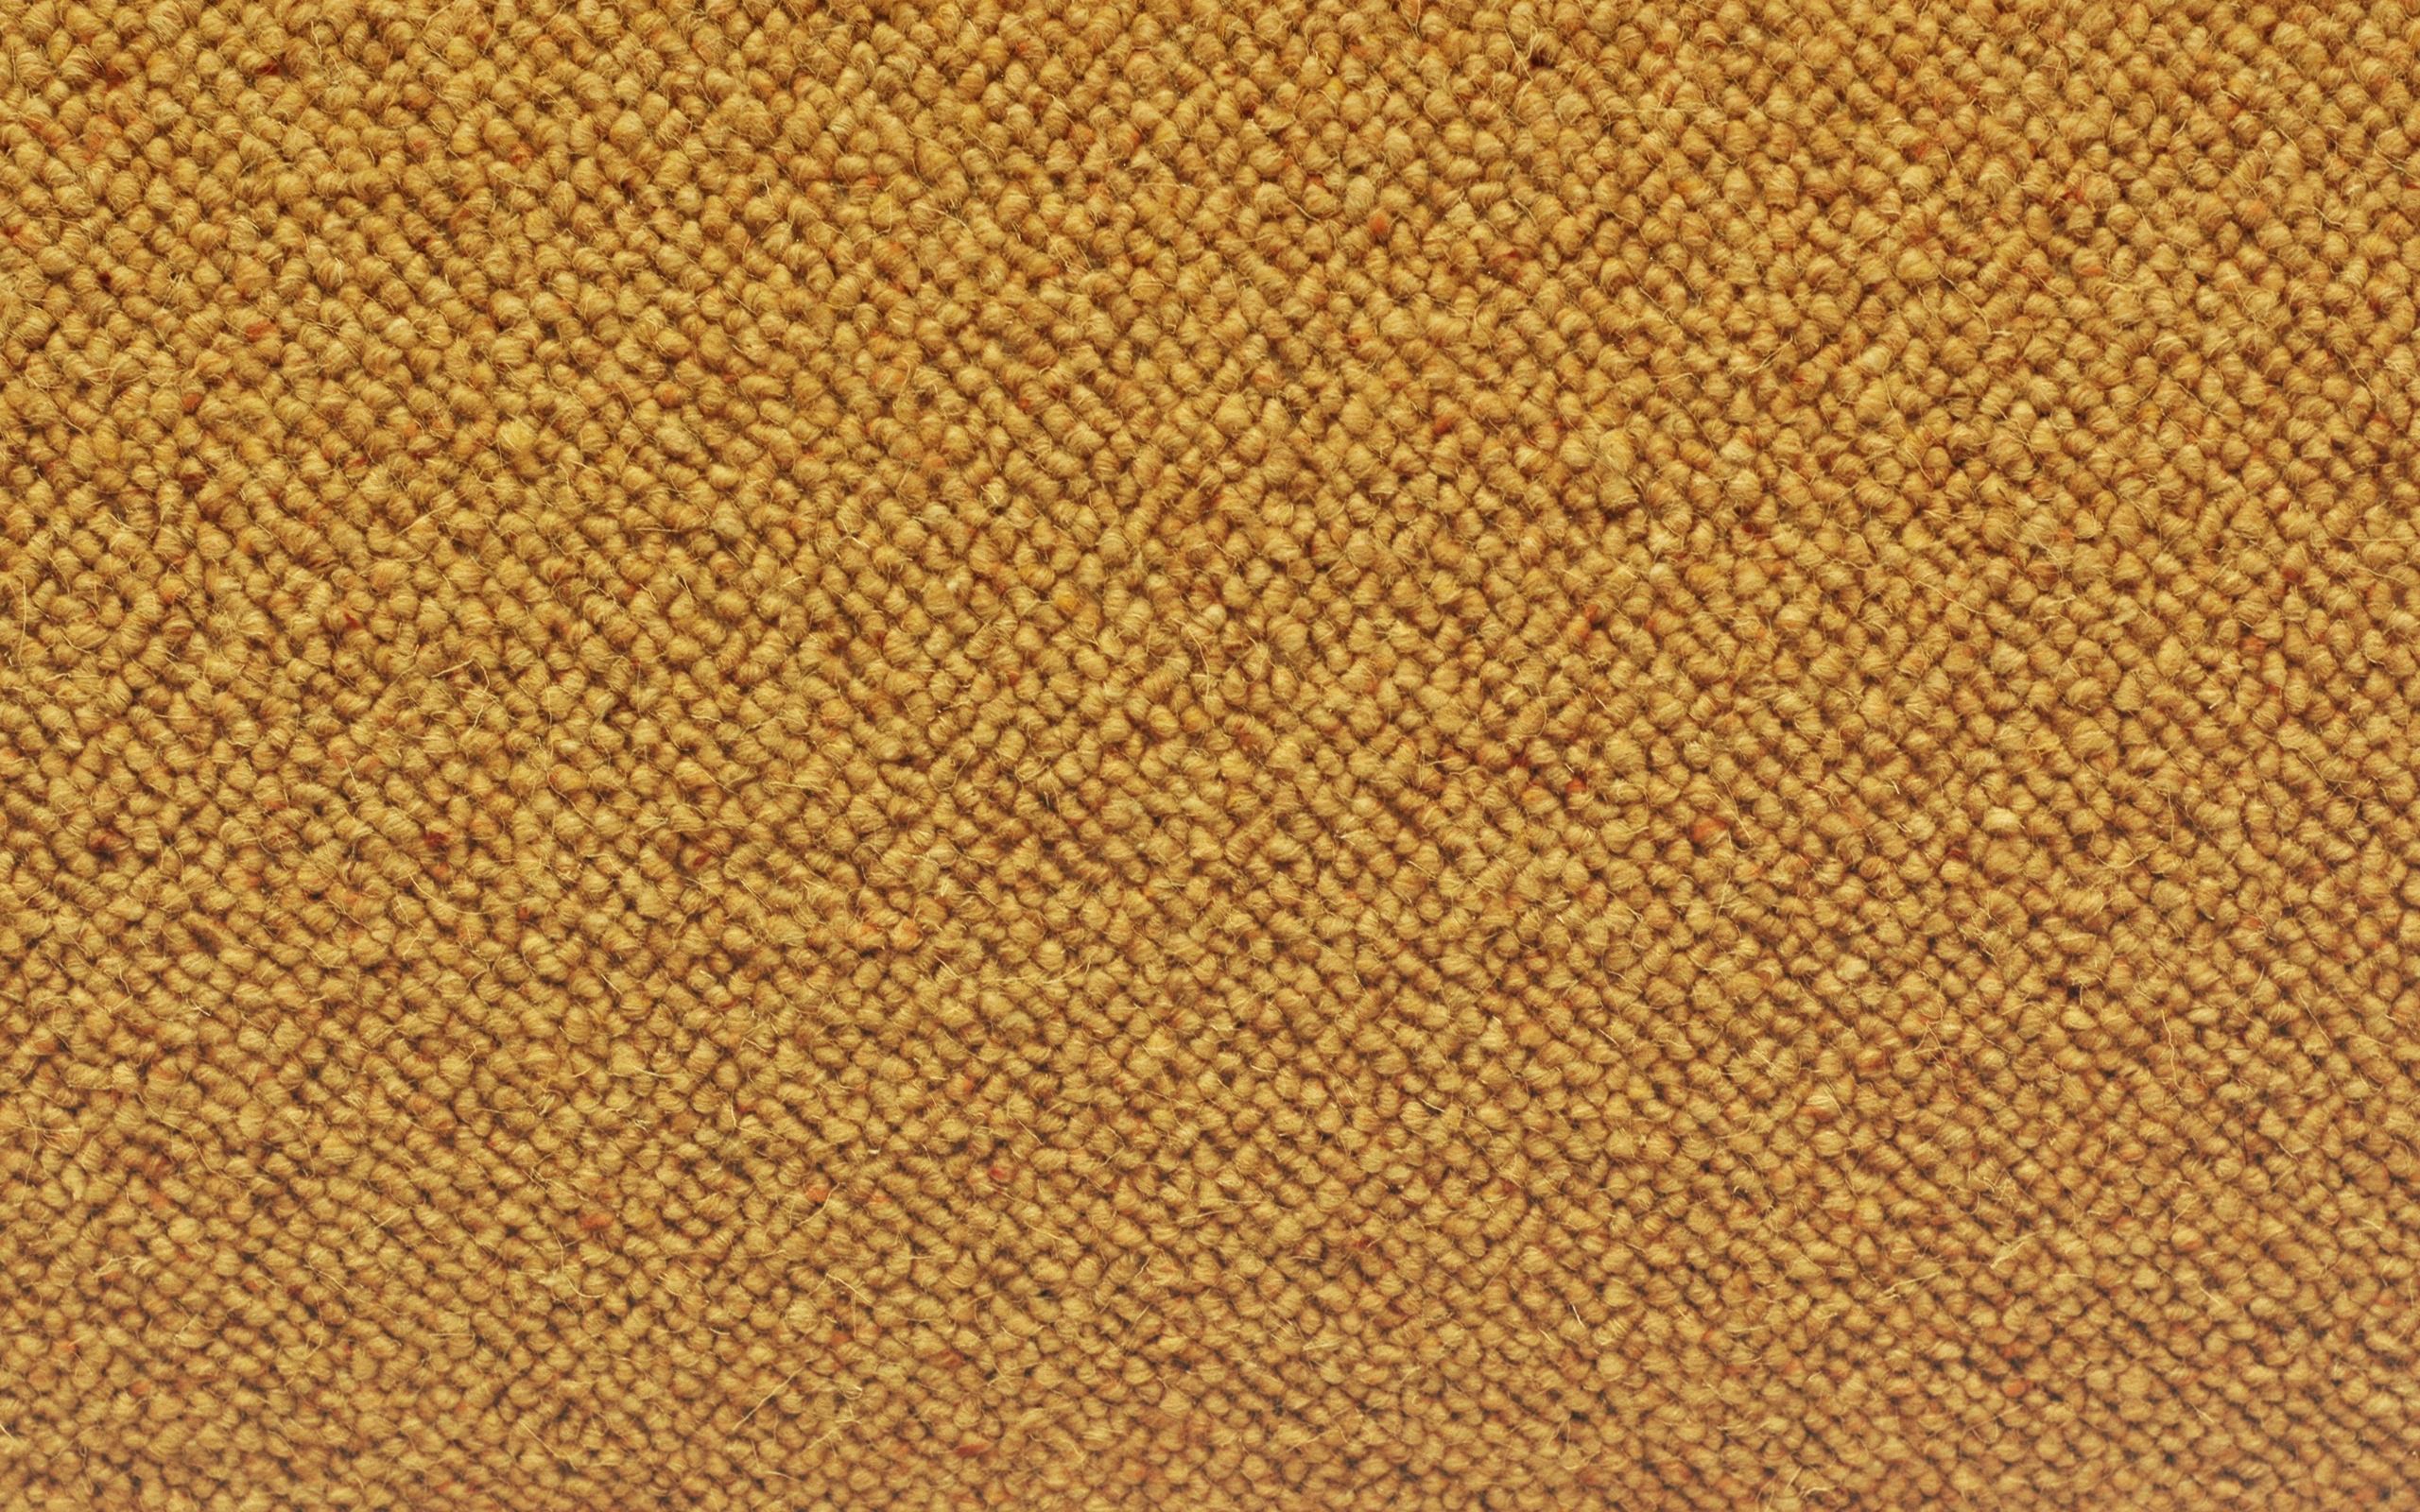 Wallpaper Carpet Background Big Texture Rug 2560x1600 Wallup 734372 Hd Wallpapers Wallhere